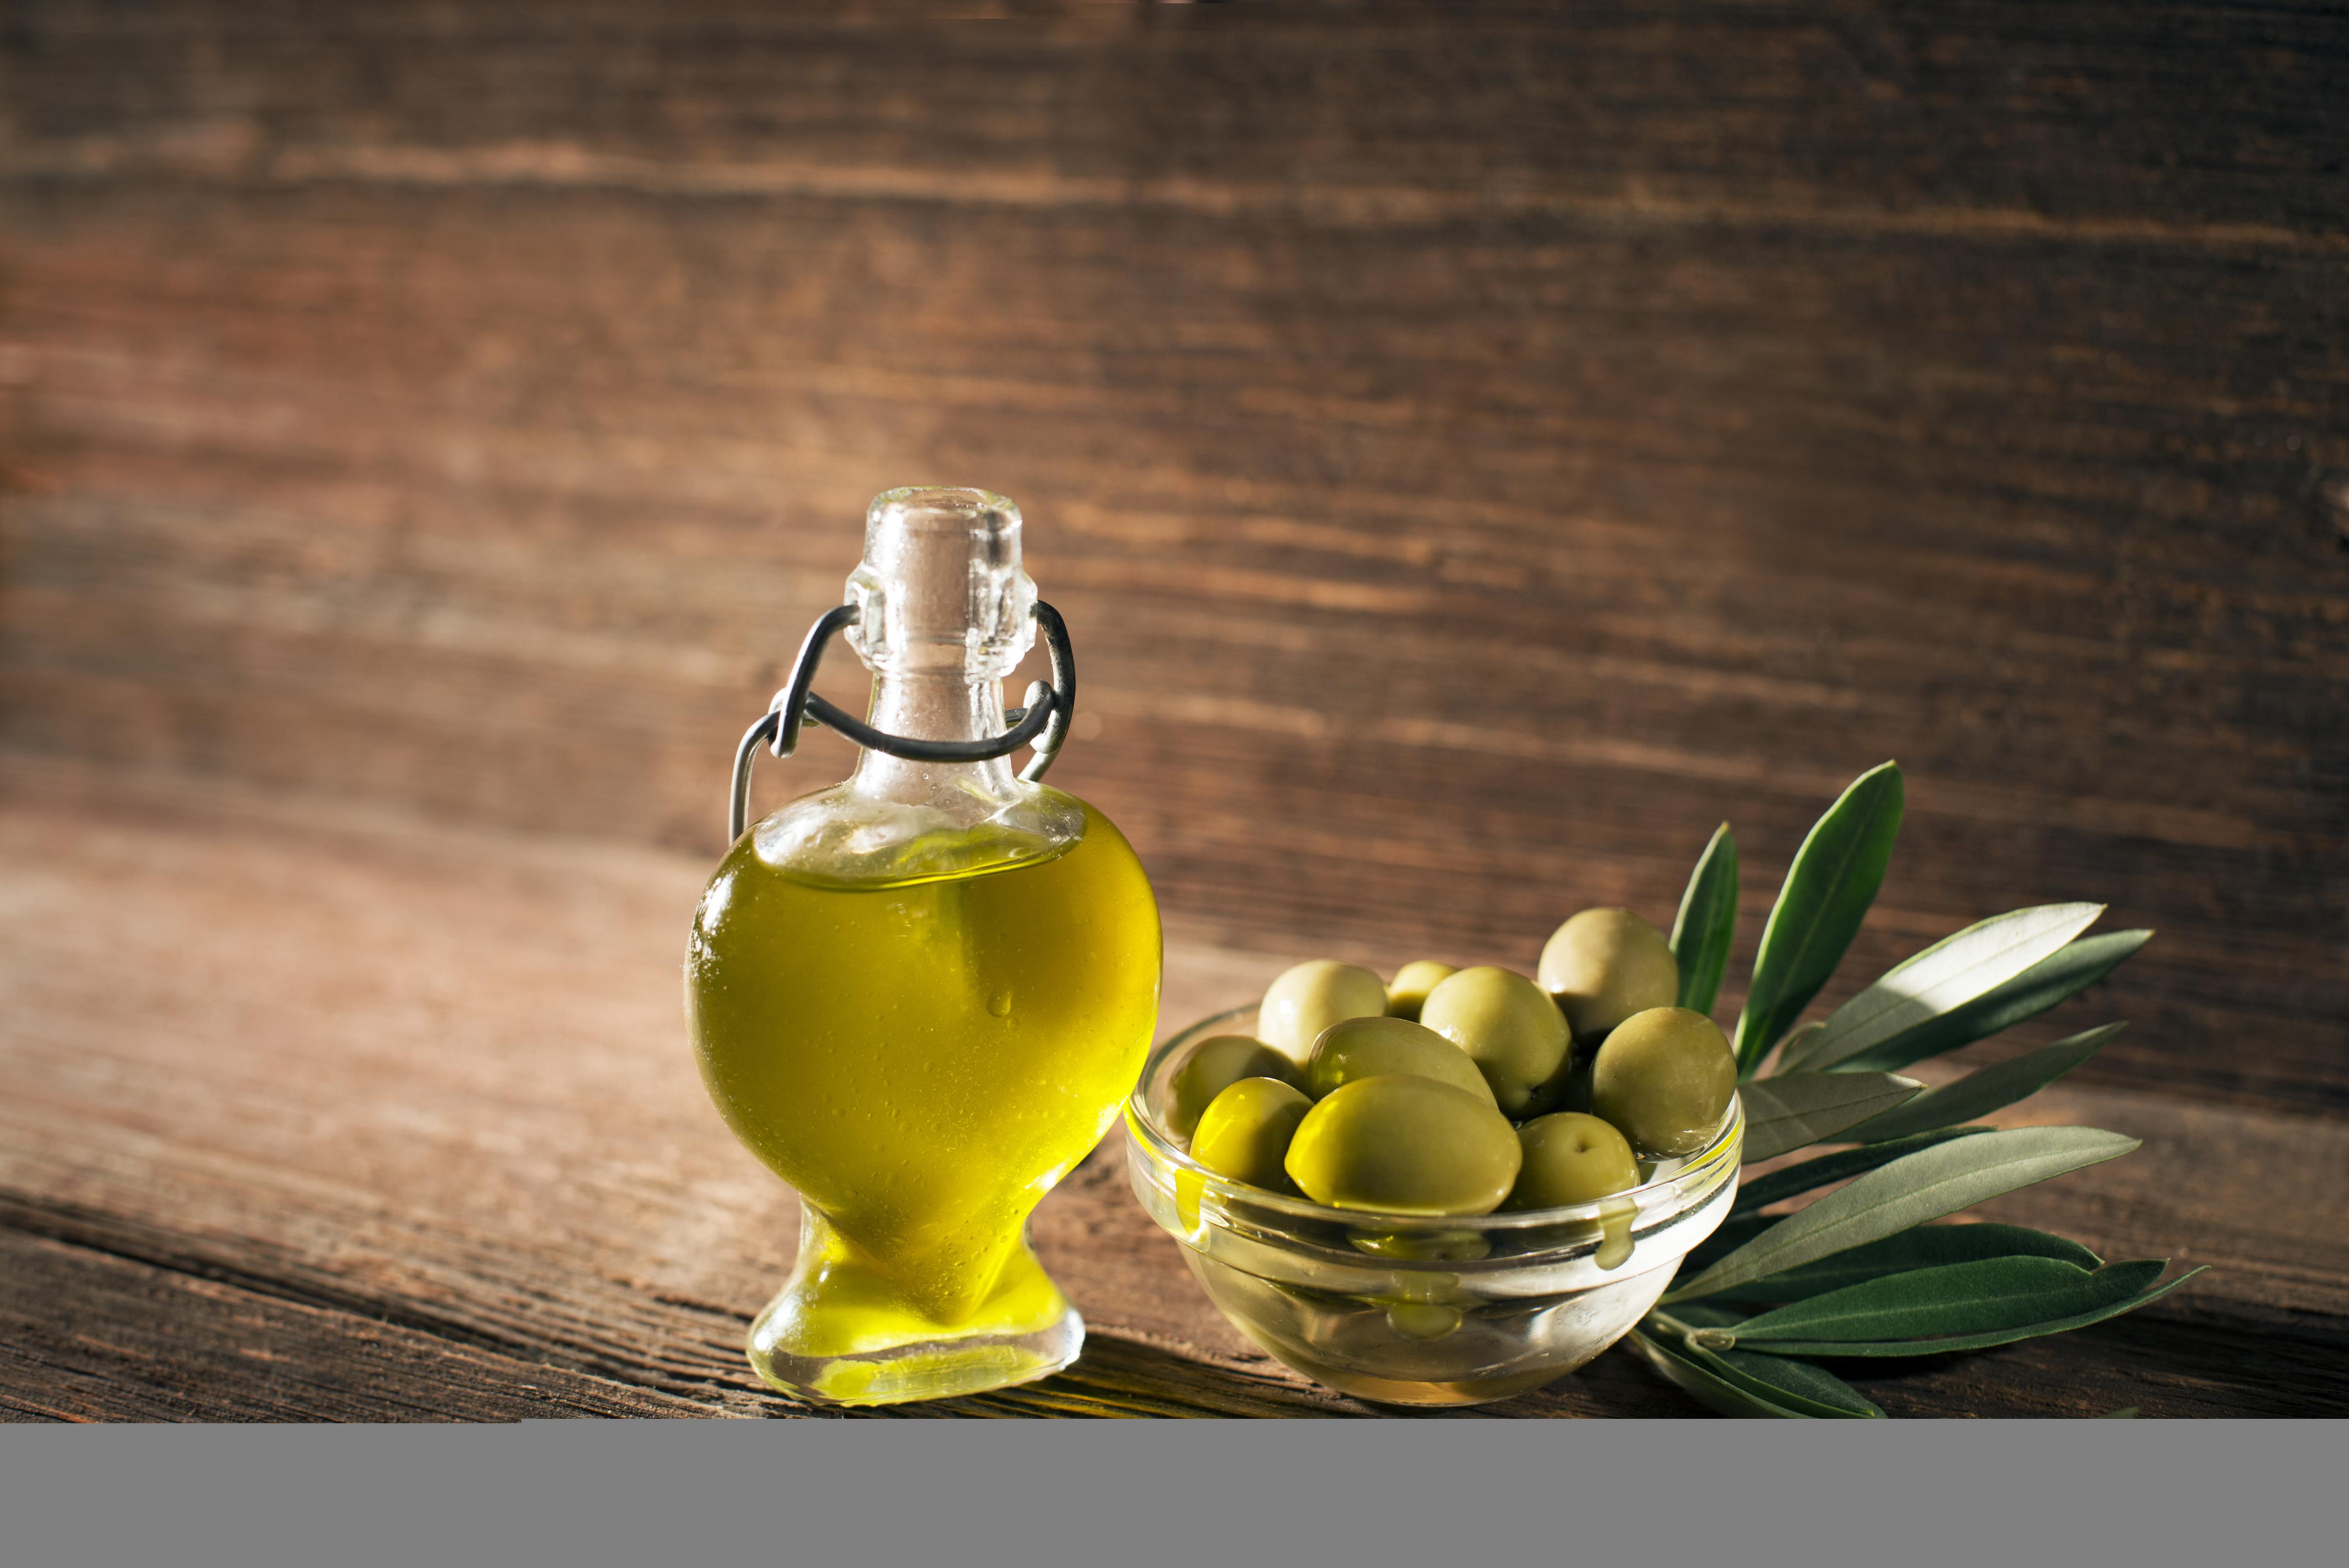 Olive Oil Wallpaper 4252x2838